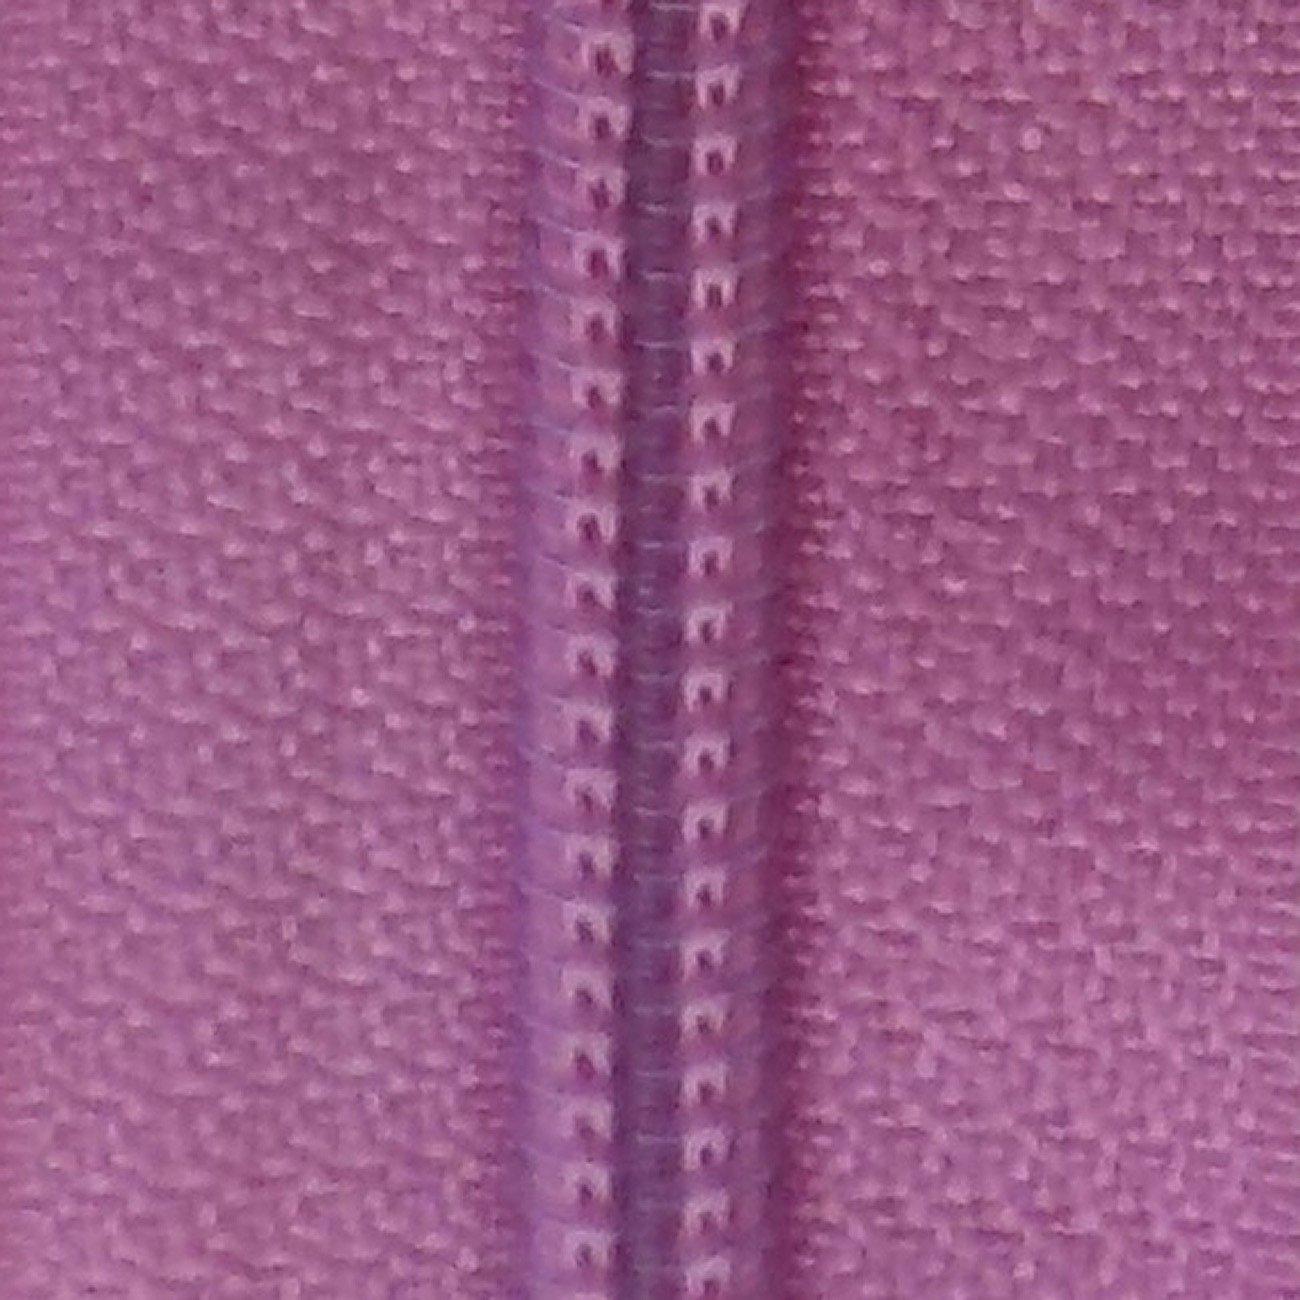 22 Non-separating Zipper Cyclamen